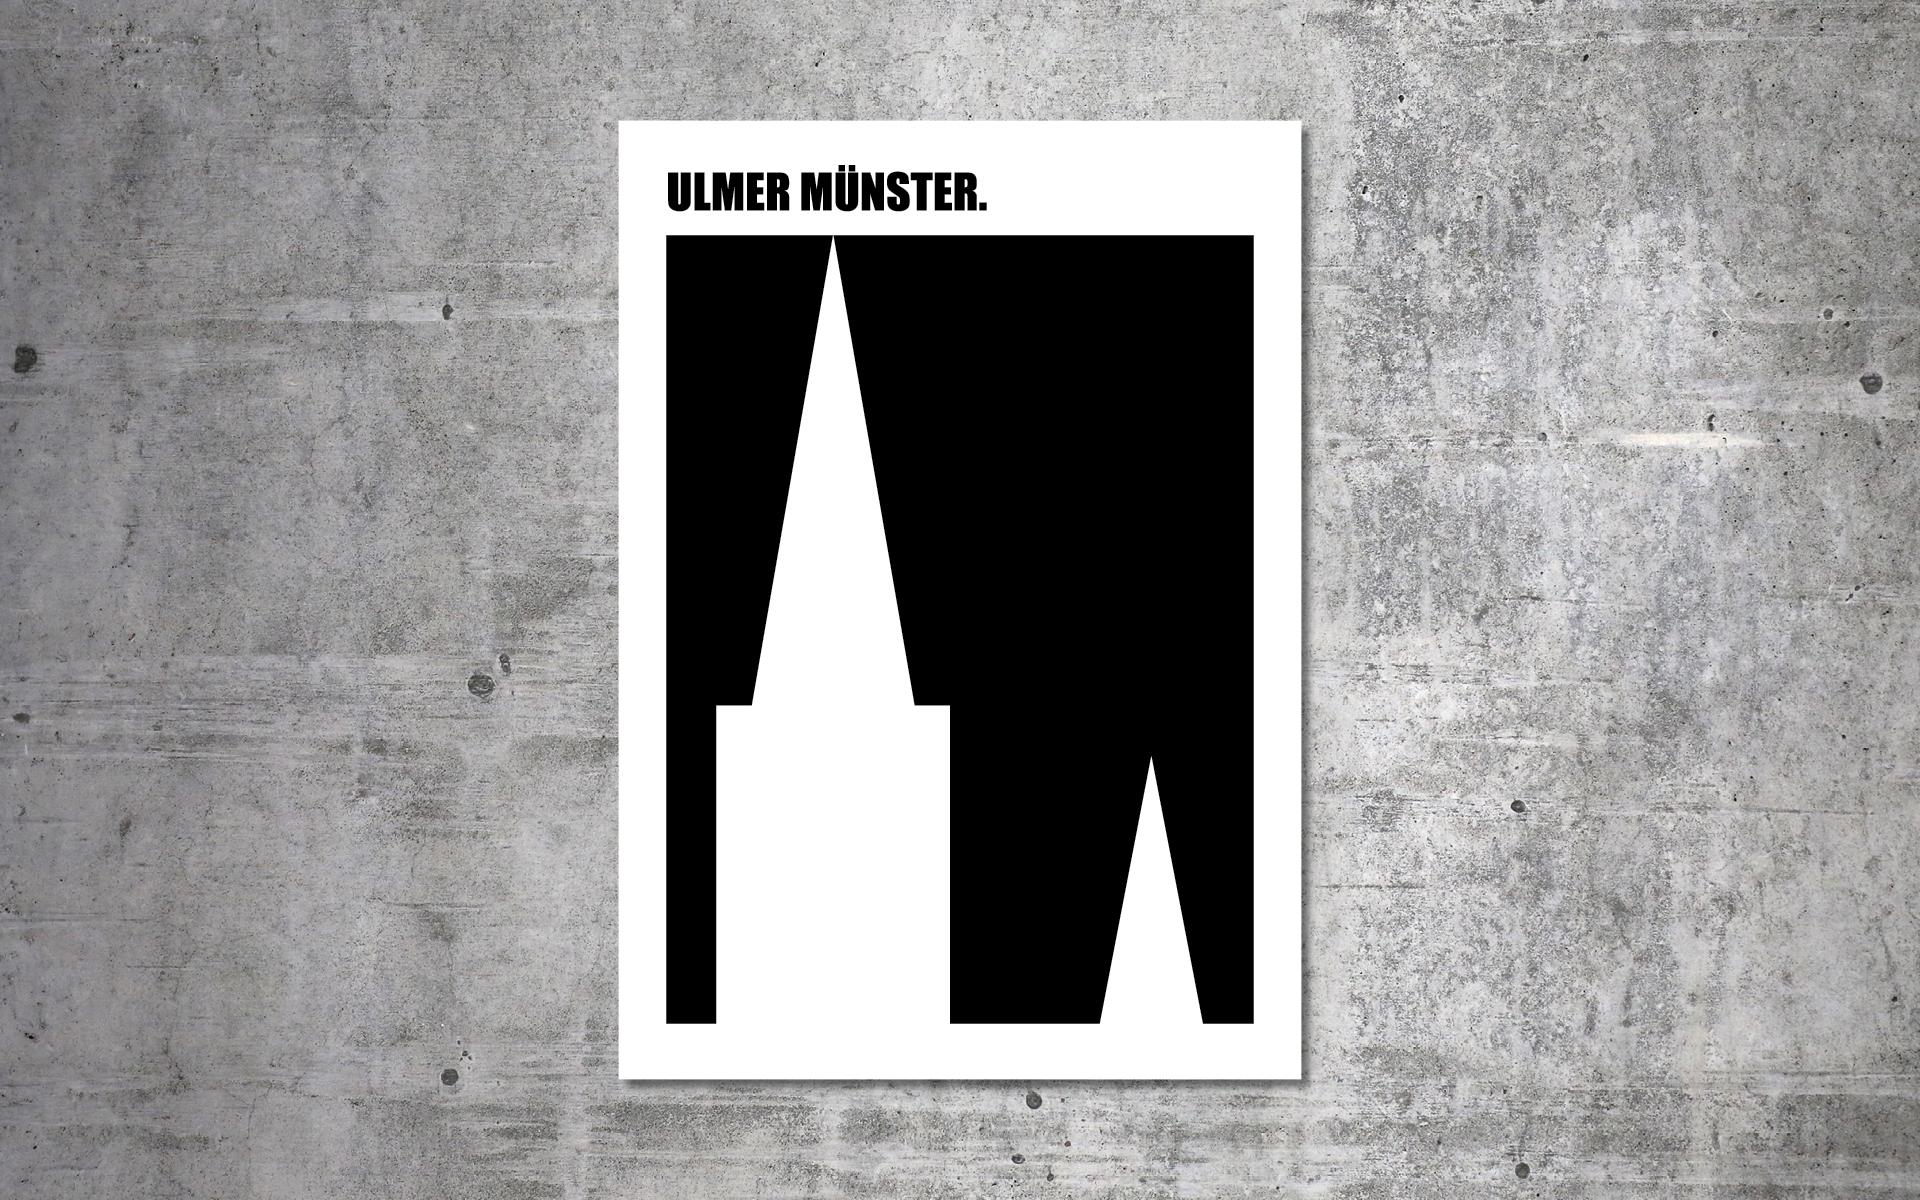 Julian Danner – Serie Ulmer Wahrzeichen, Ulmer Münster